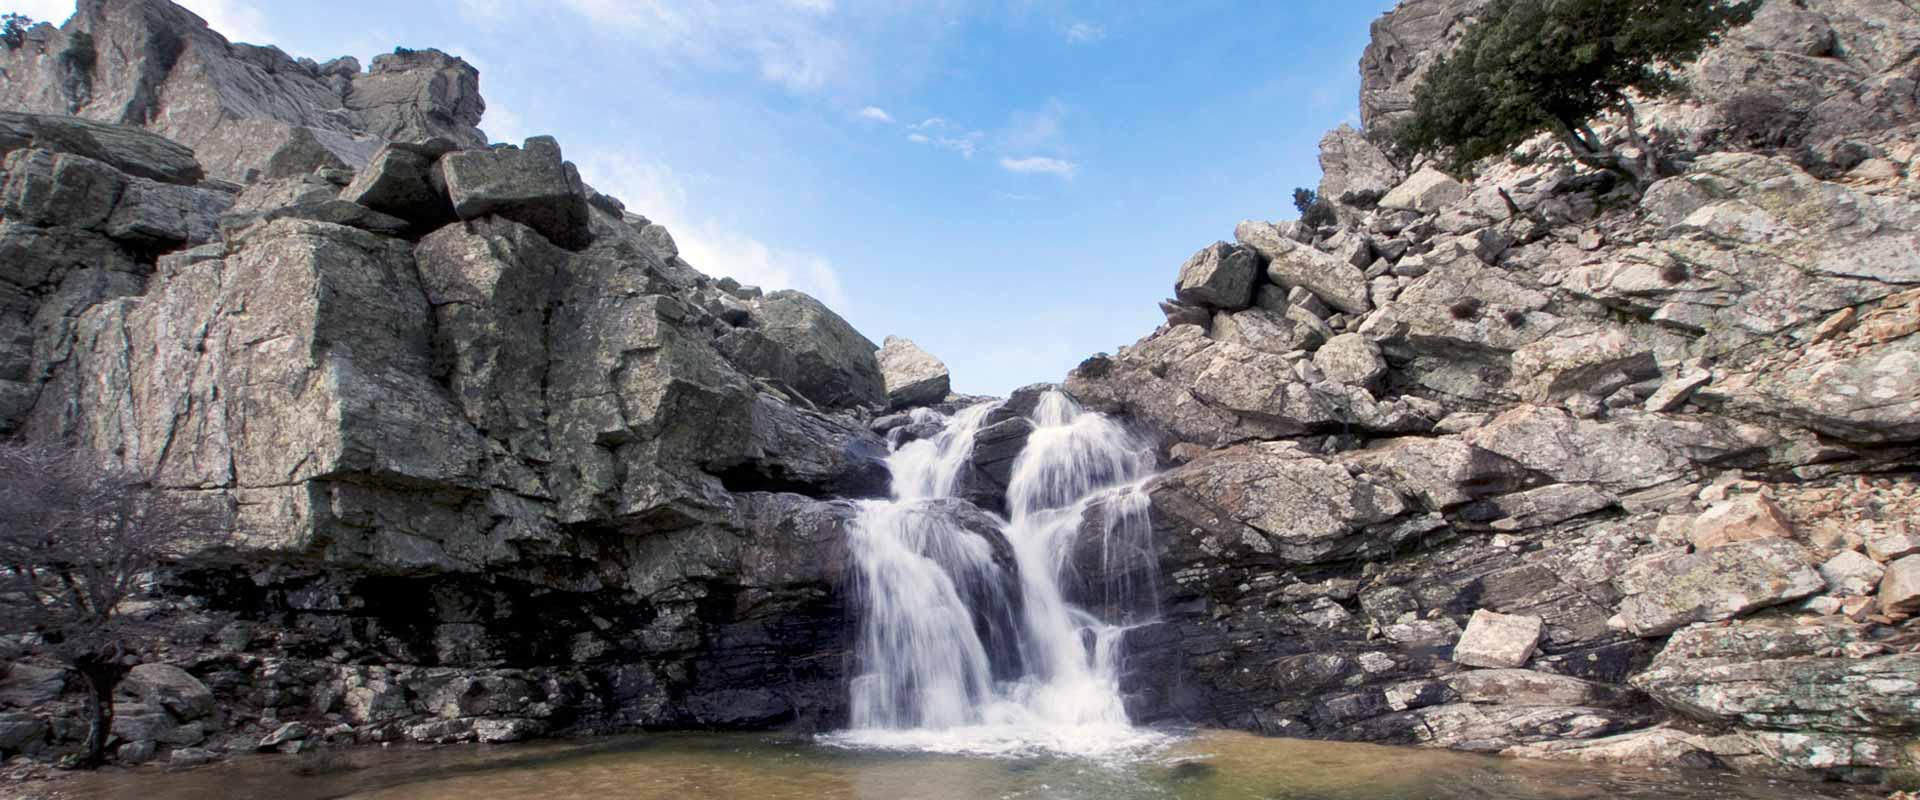 ikaria olivia villas selin waterfall image